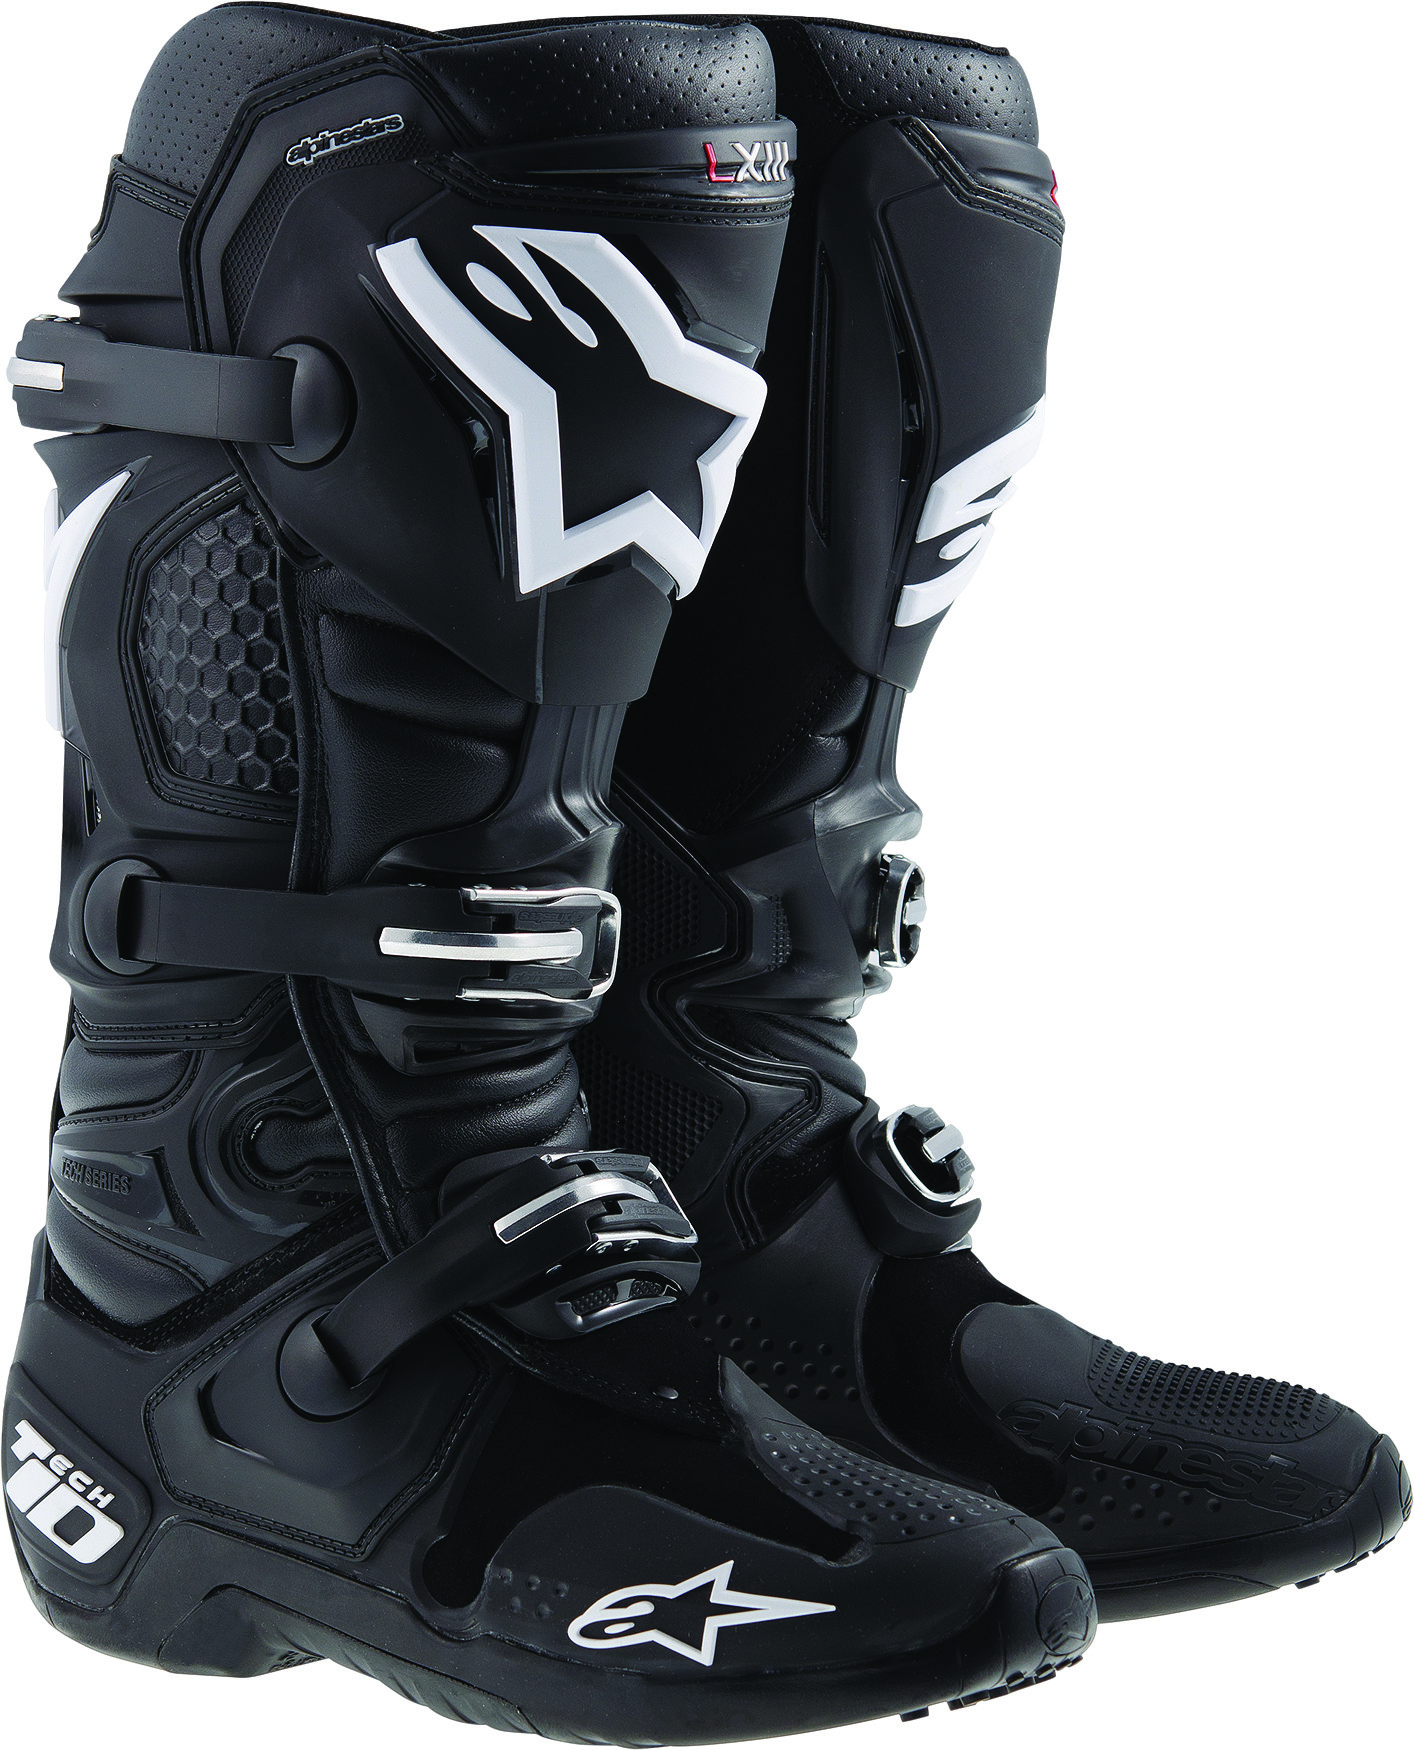 Tech 10 Boots Black Sz 10